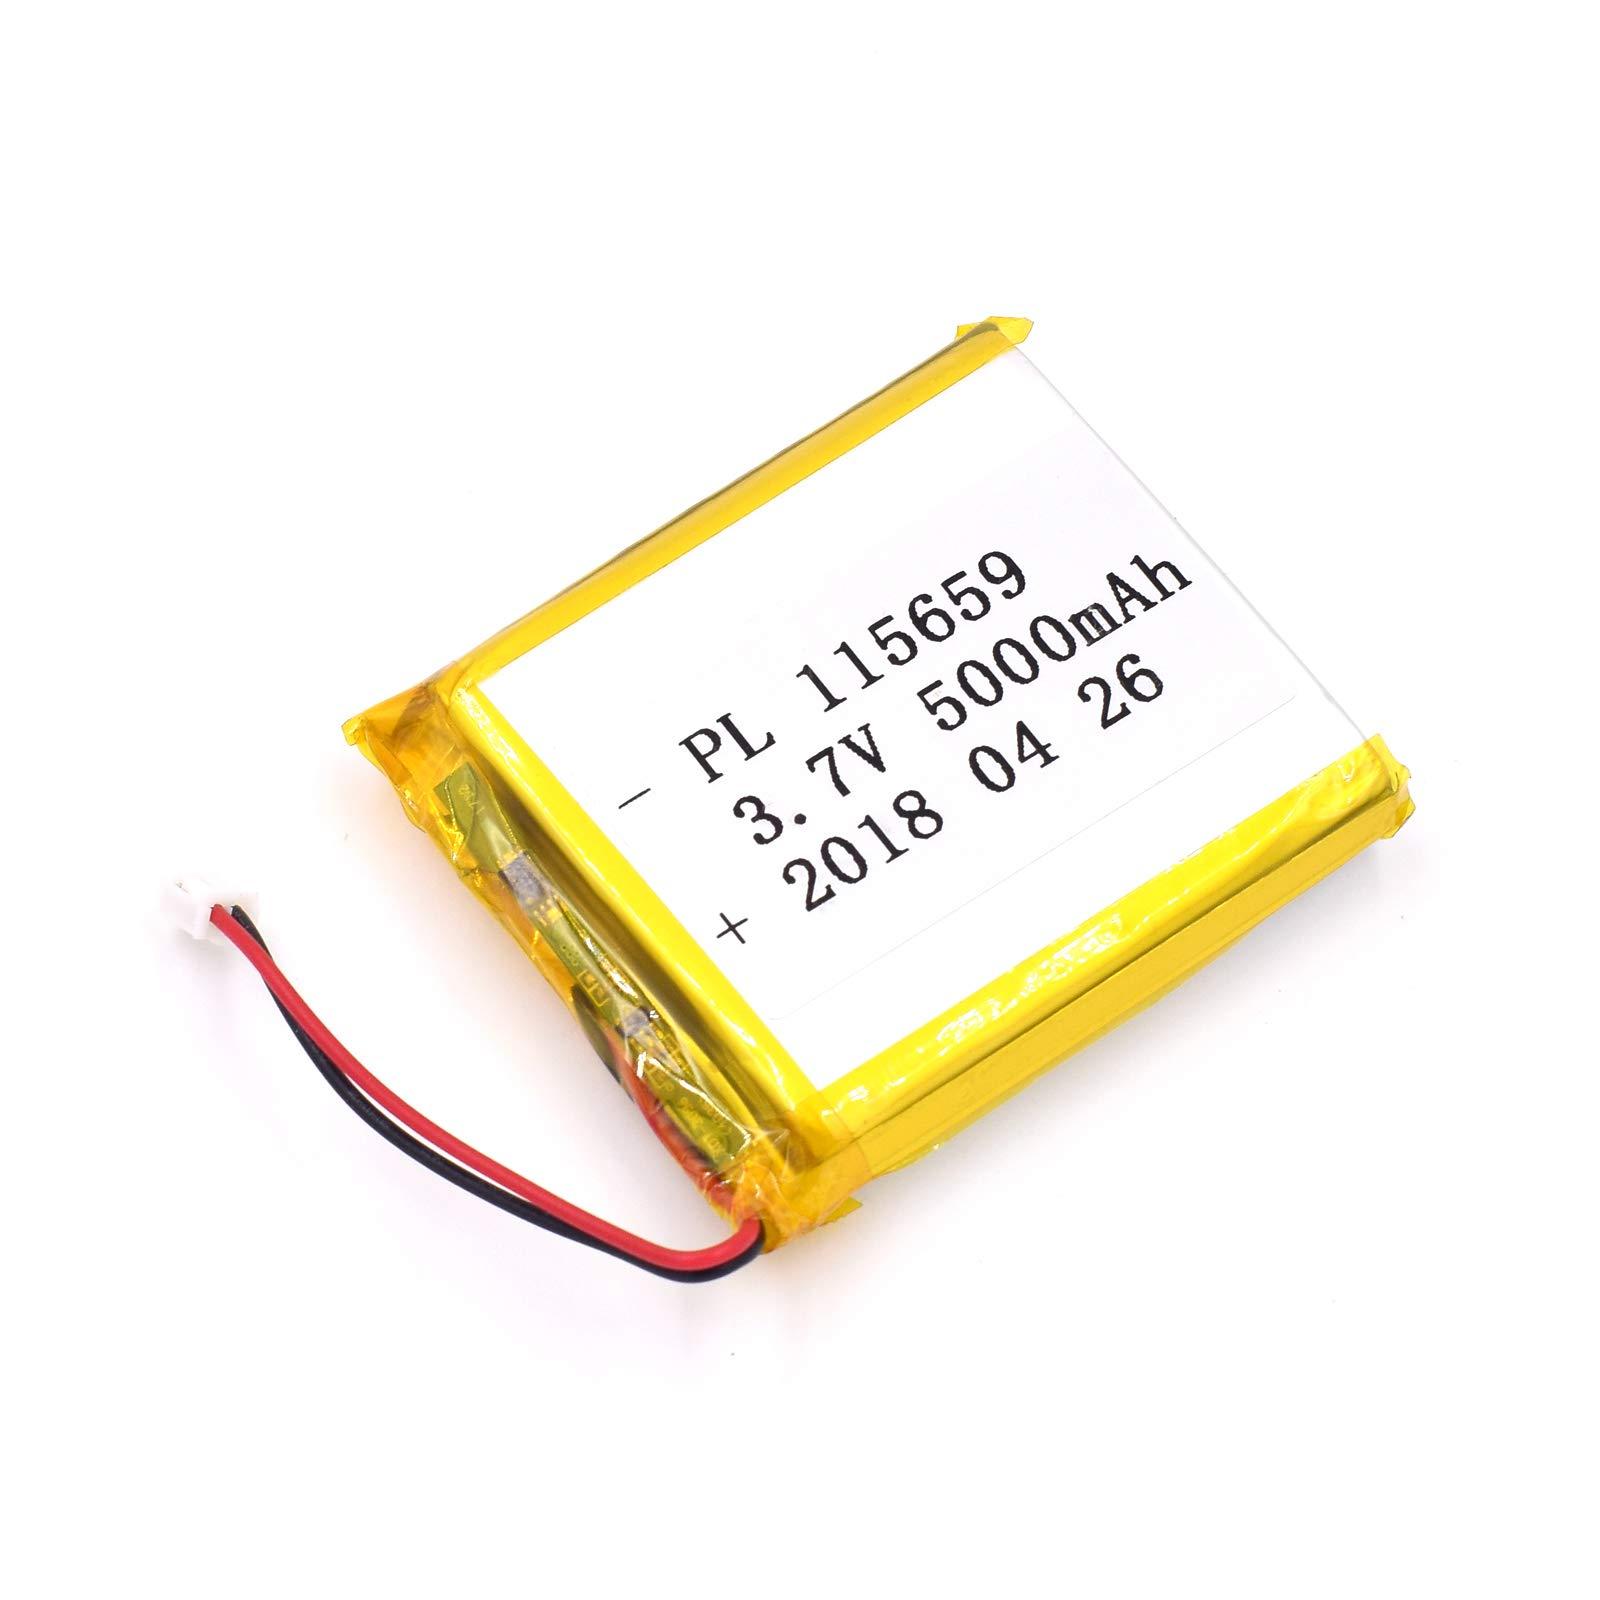 Bateria Lipo 3.7V 5000mAh 115659 Recargable JST Conector